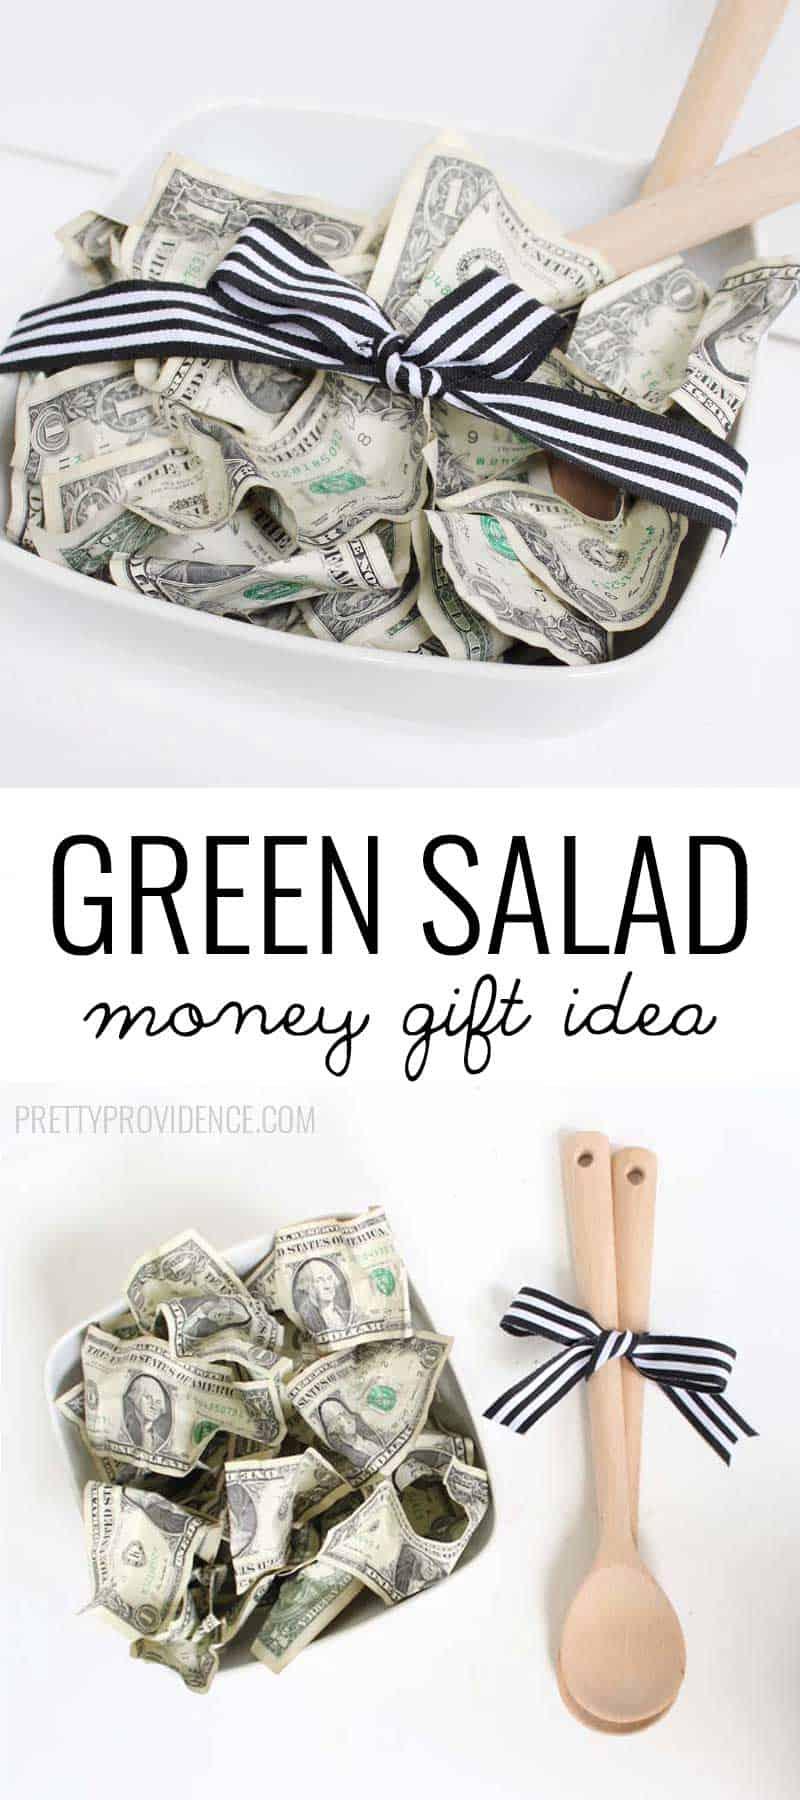 Salad Bowl + Dollar Bills = Cutest wedding gift EVER!